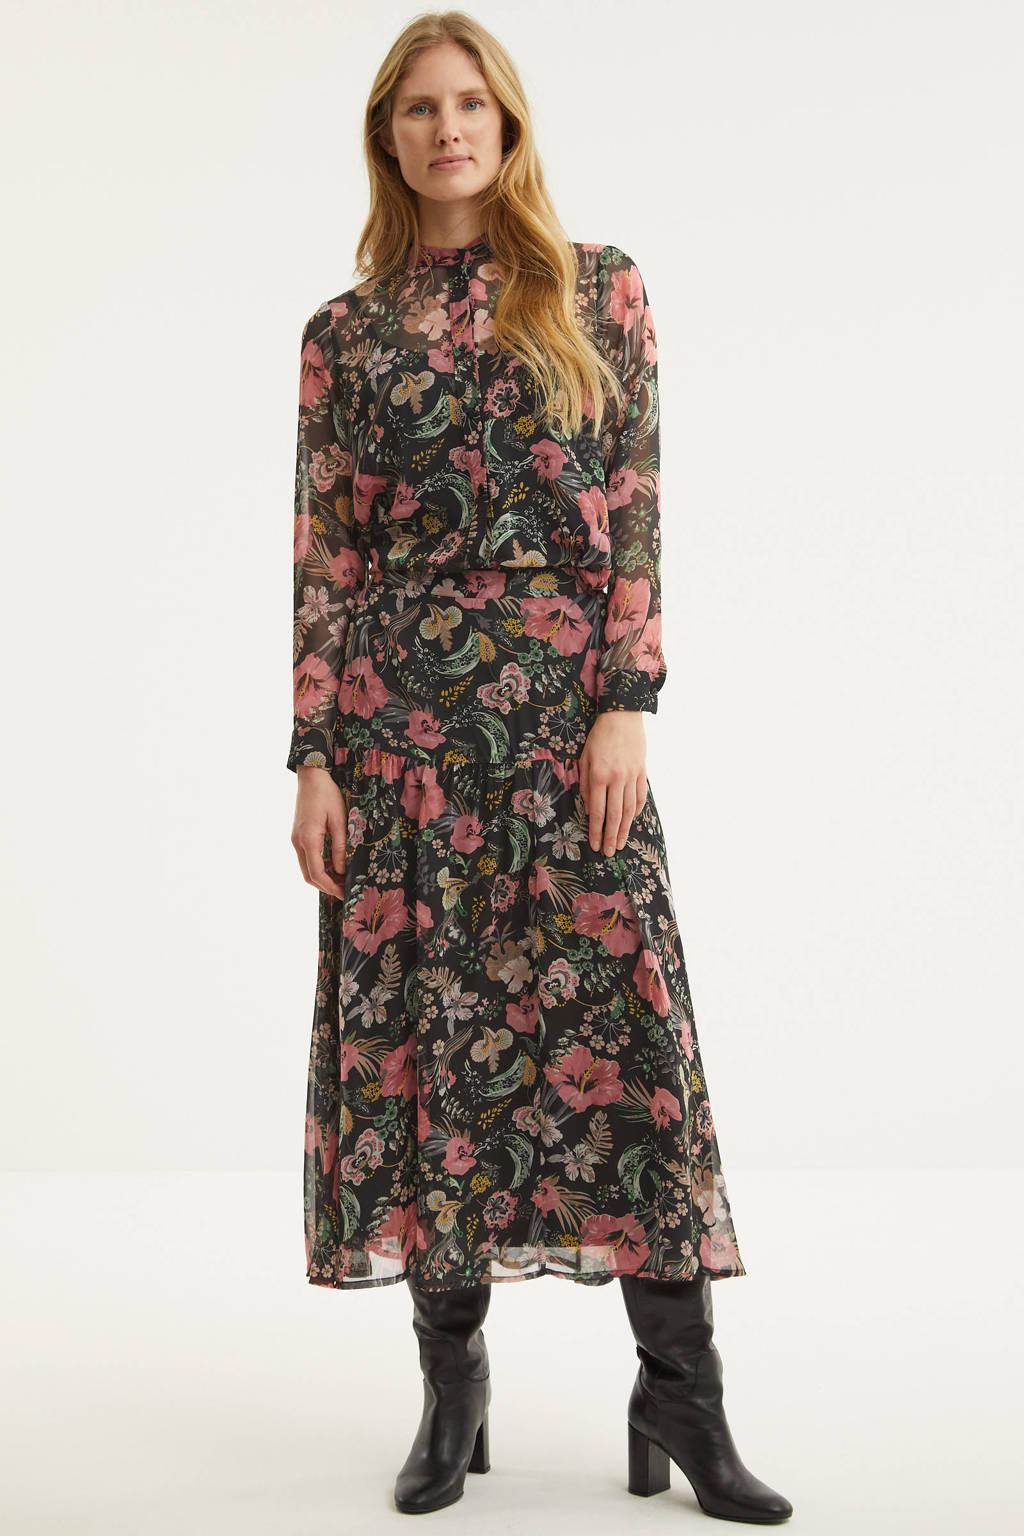 ICHI gebloemde semi-transparante blouse zwart/multi, Zwart/multi